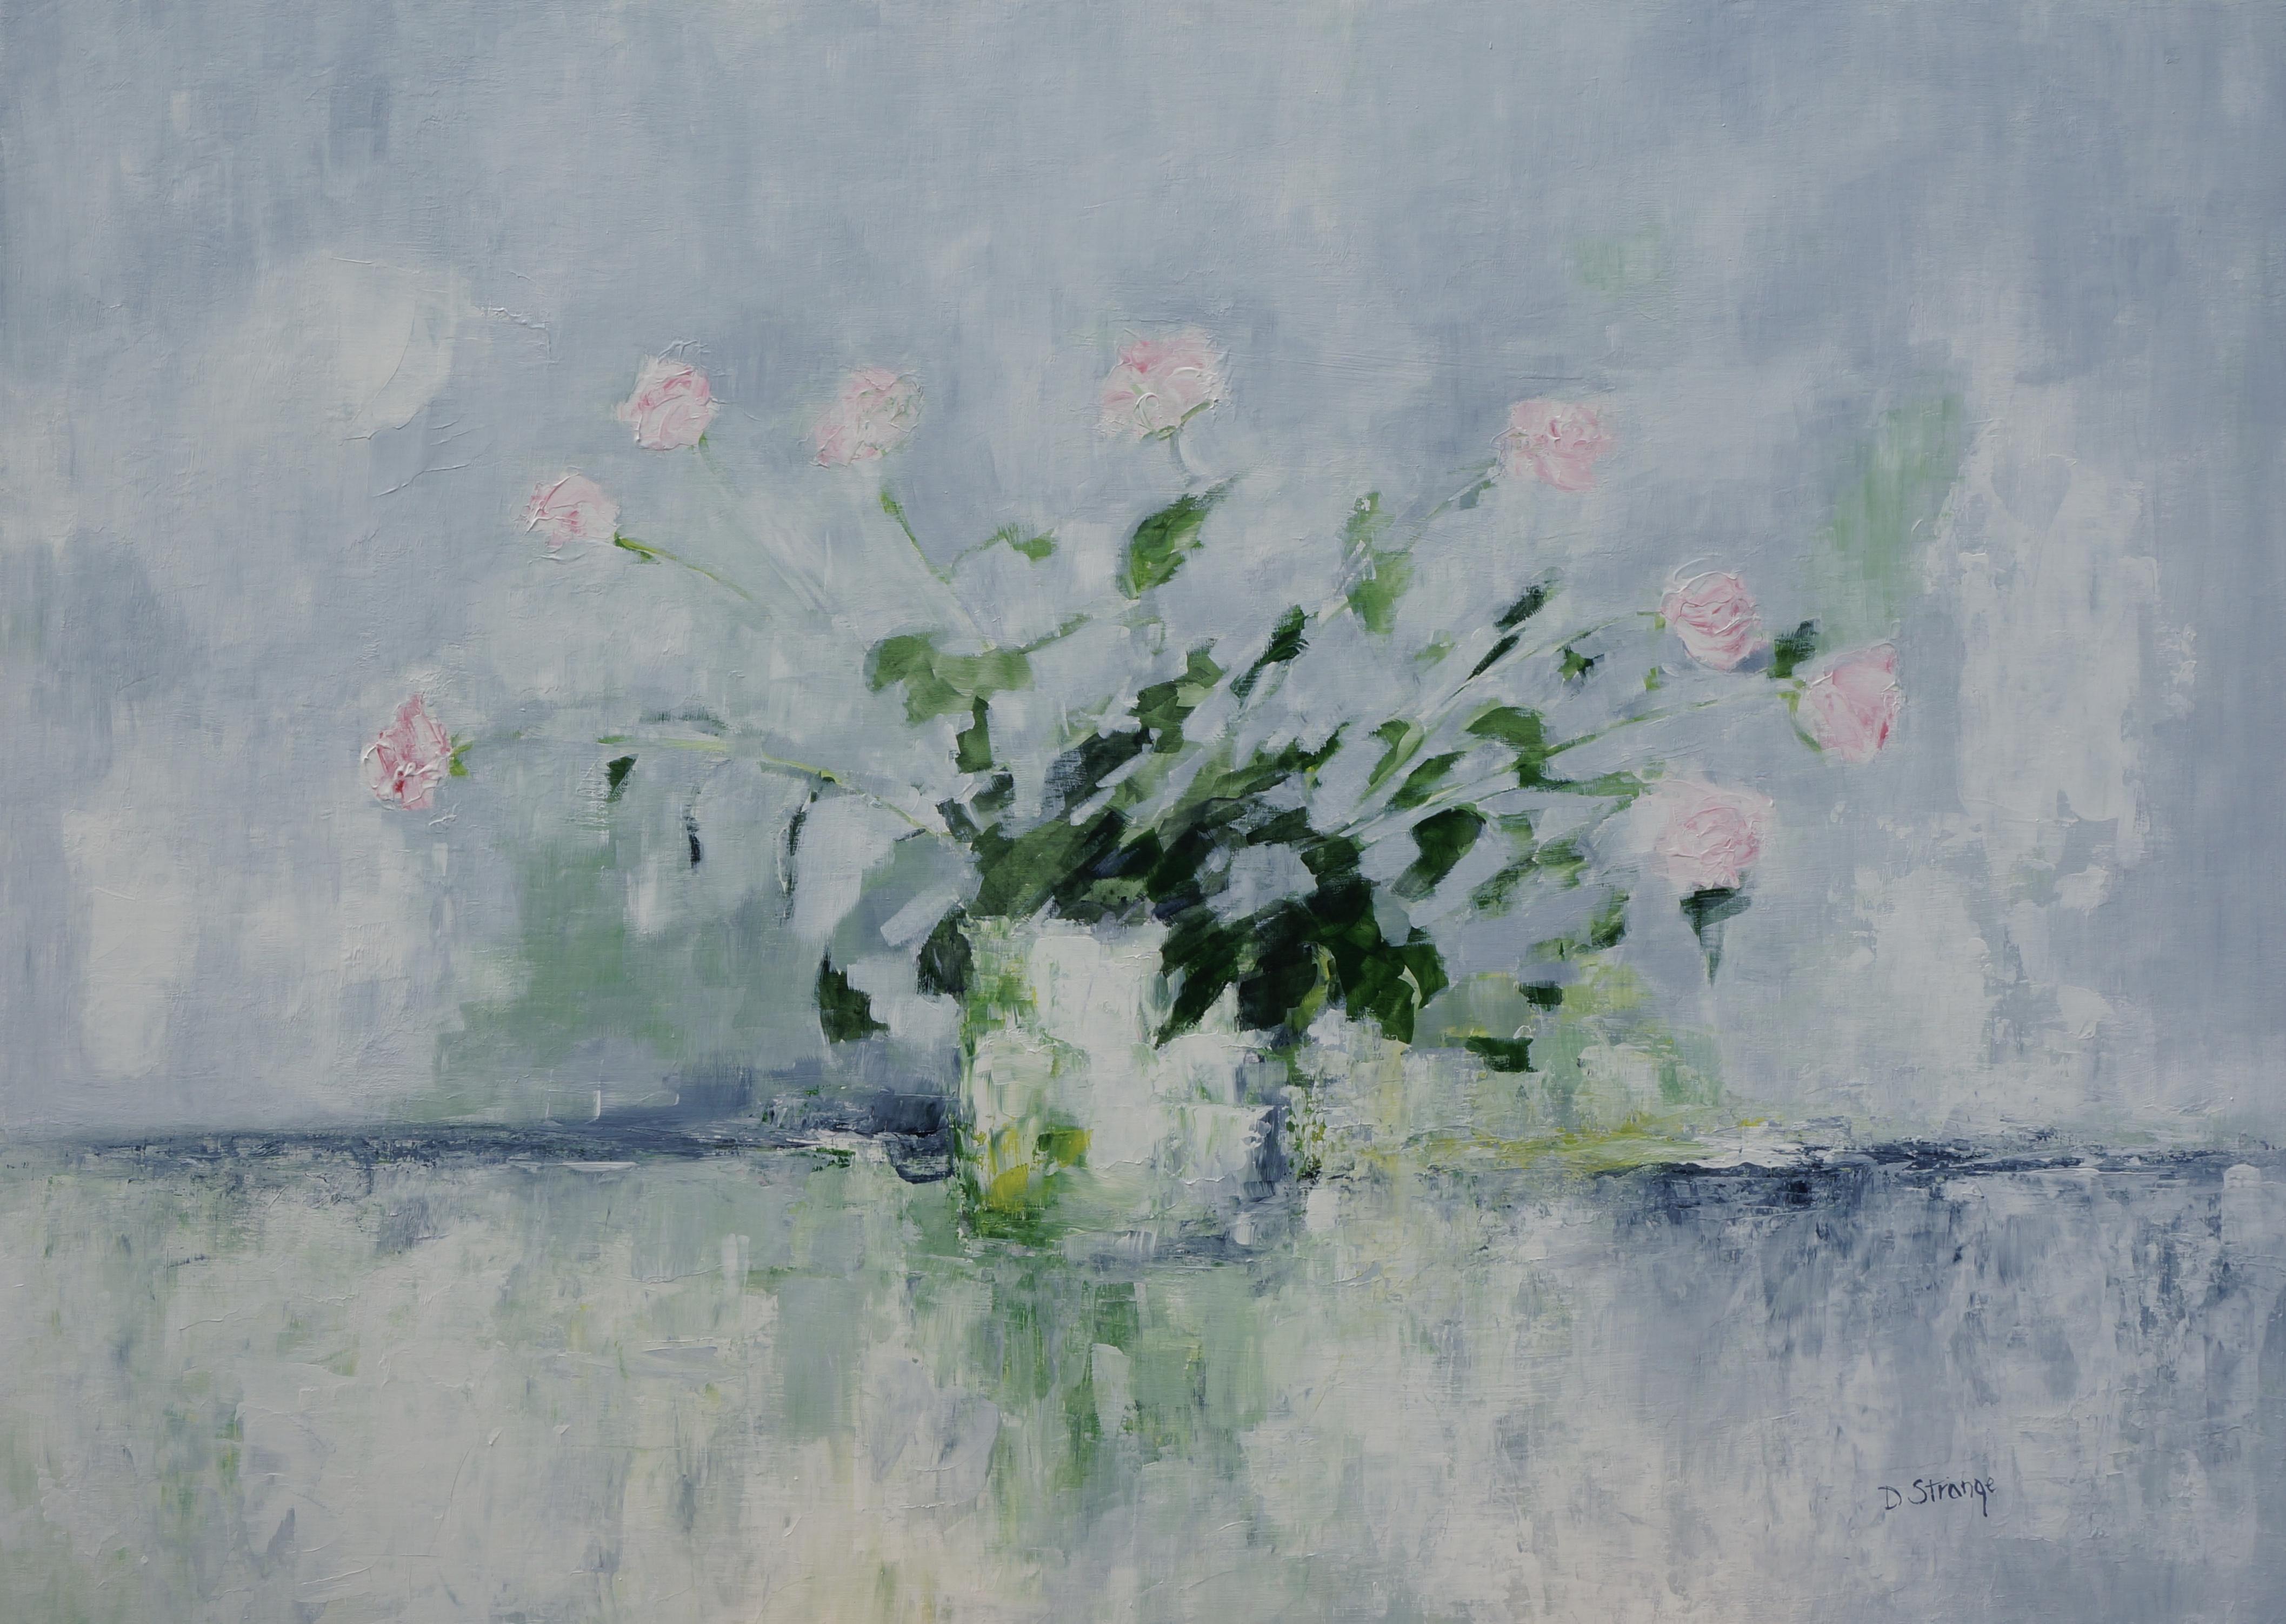 Misty Roses